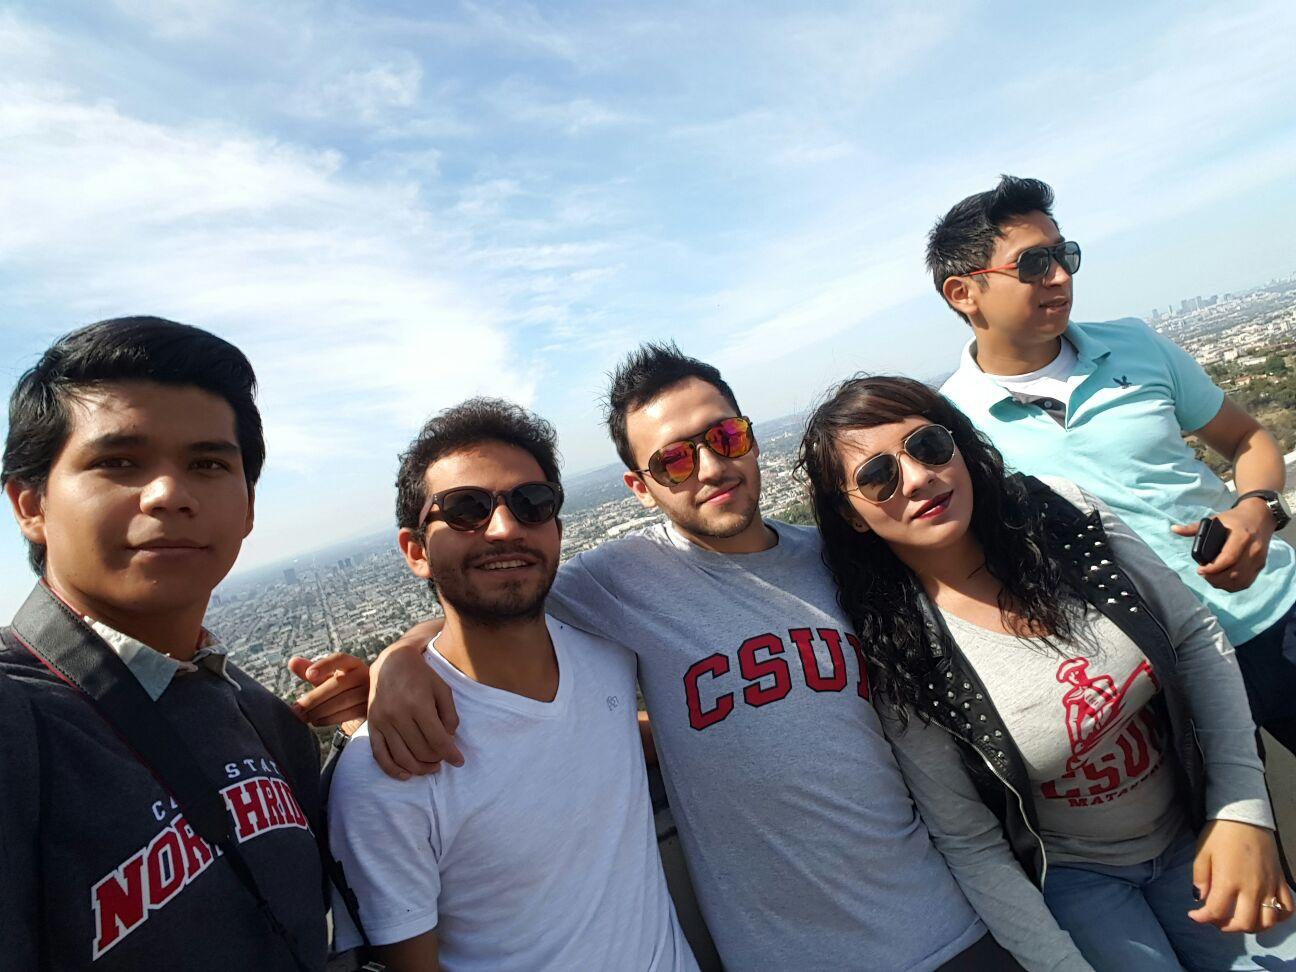 At the top of LA